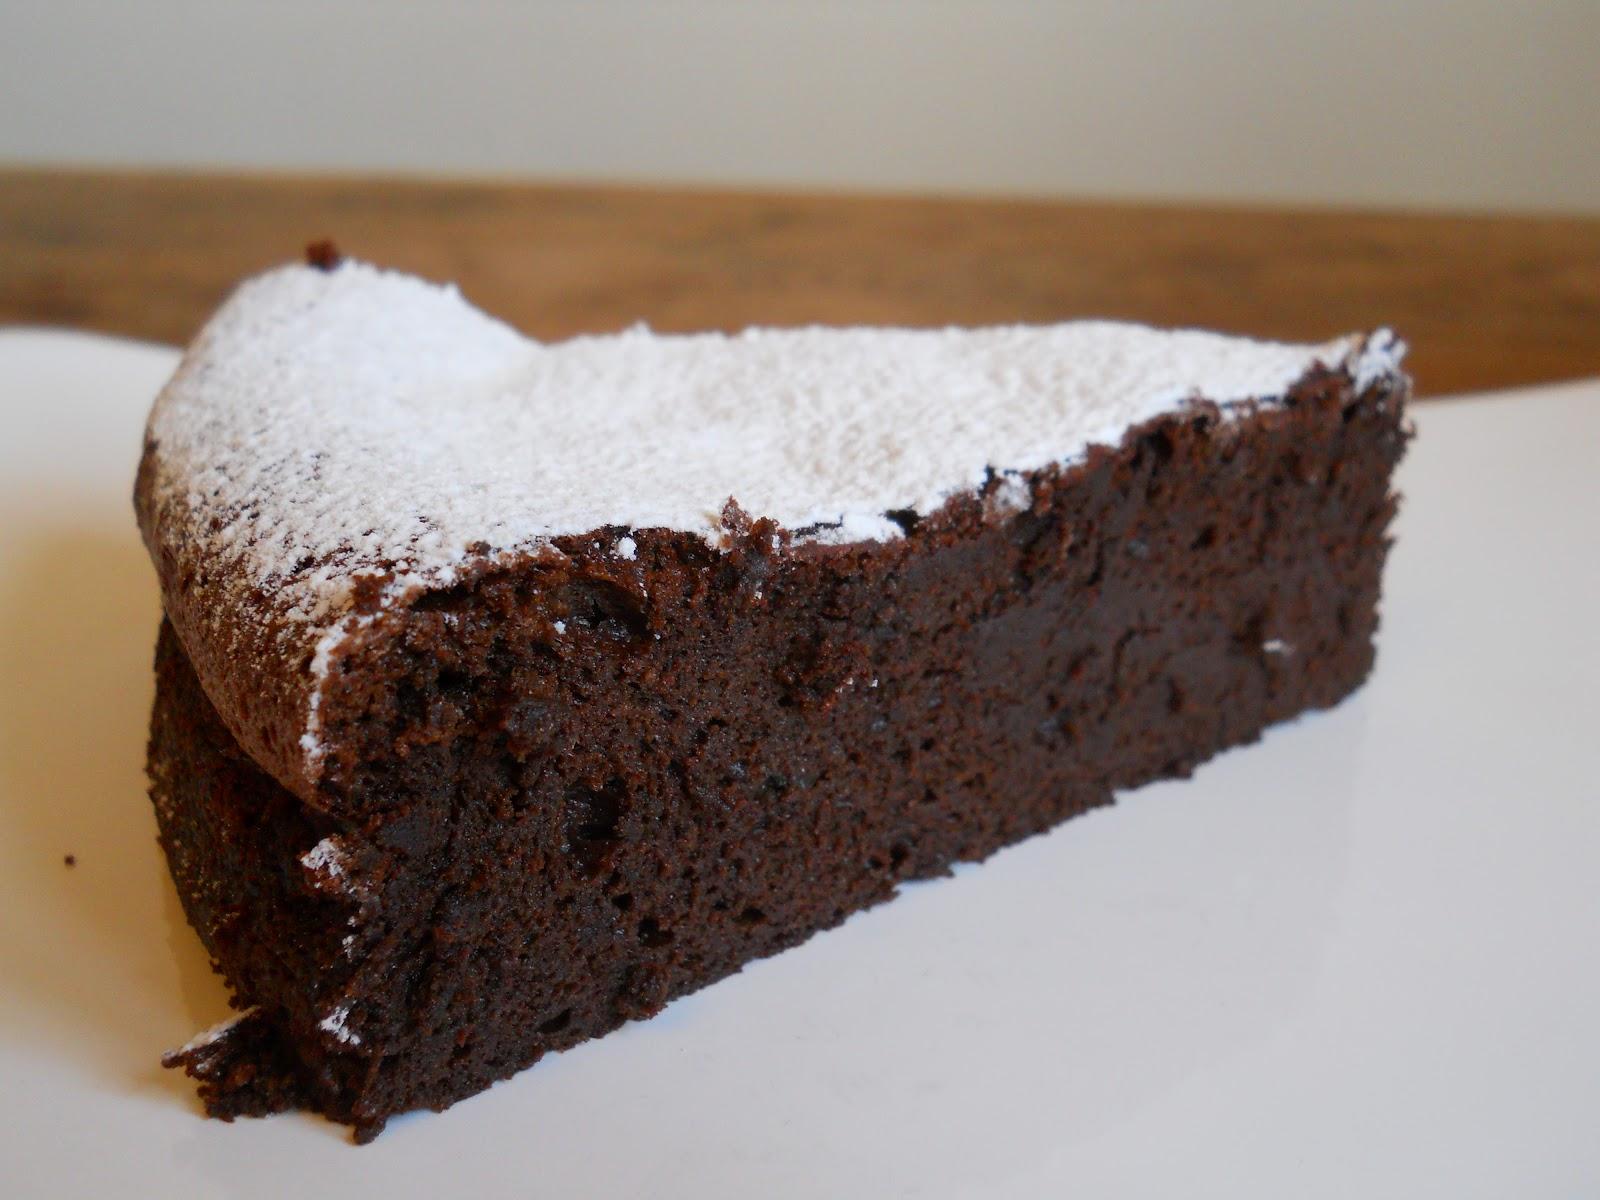 Chocolate Mousse Cake + Caramel Ice Cream - Vintage Kitchen